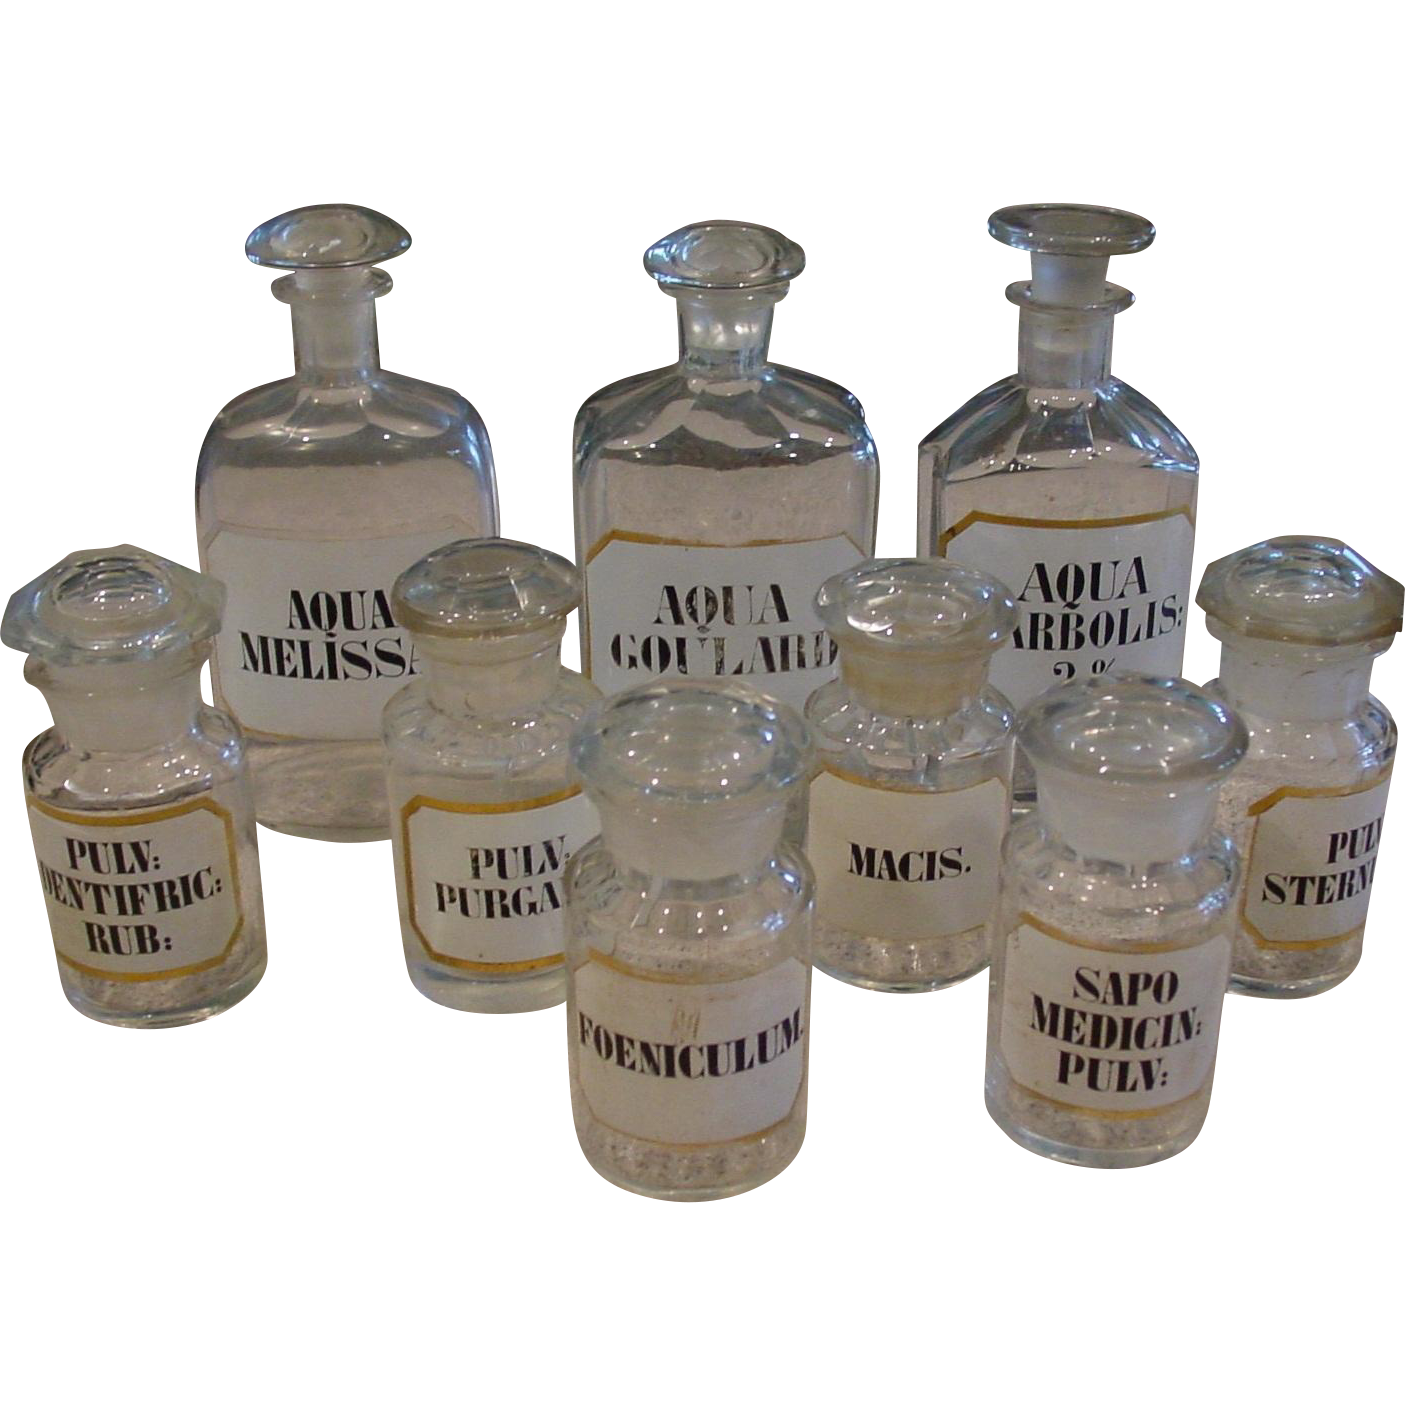 9 vintage drug Apothecary bottles